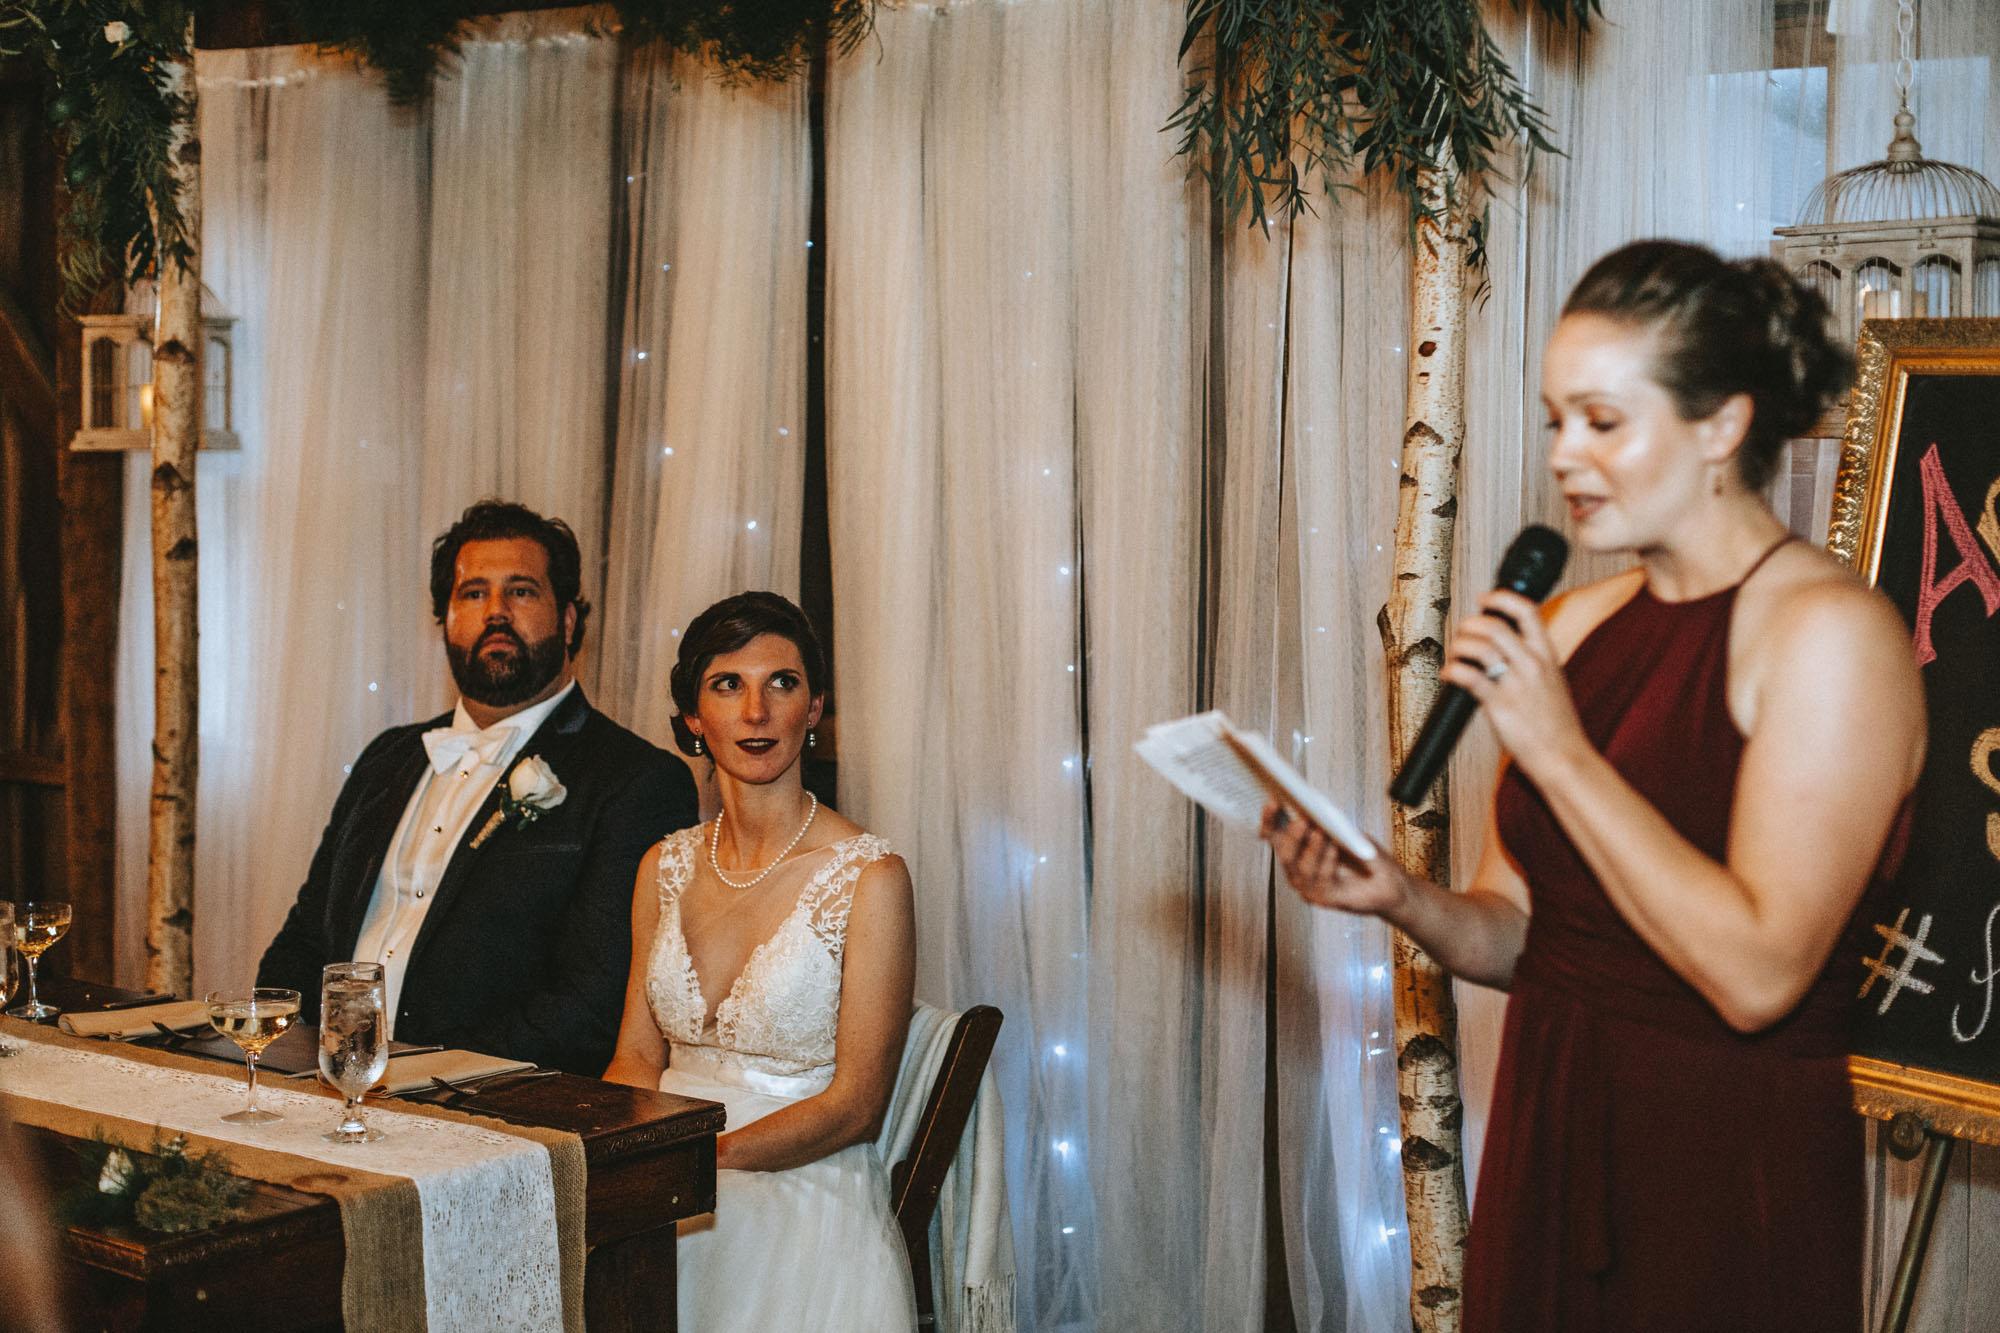 Twisted-Oaks-Studio-Arianne-Sean-Wedding-483.jpg